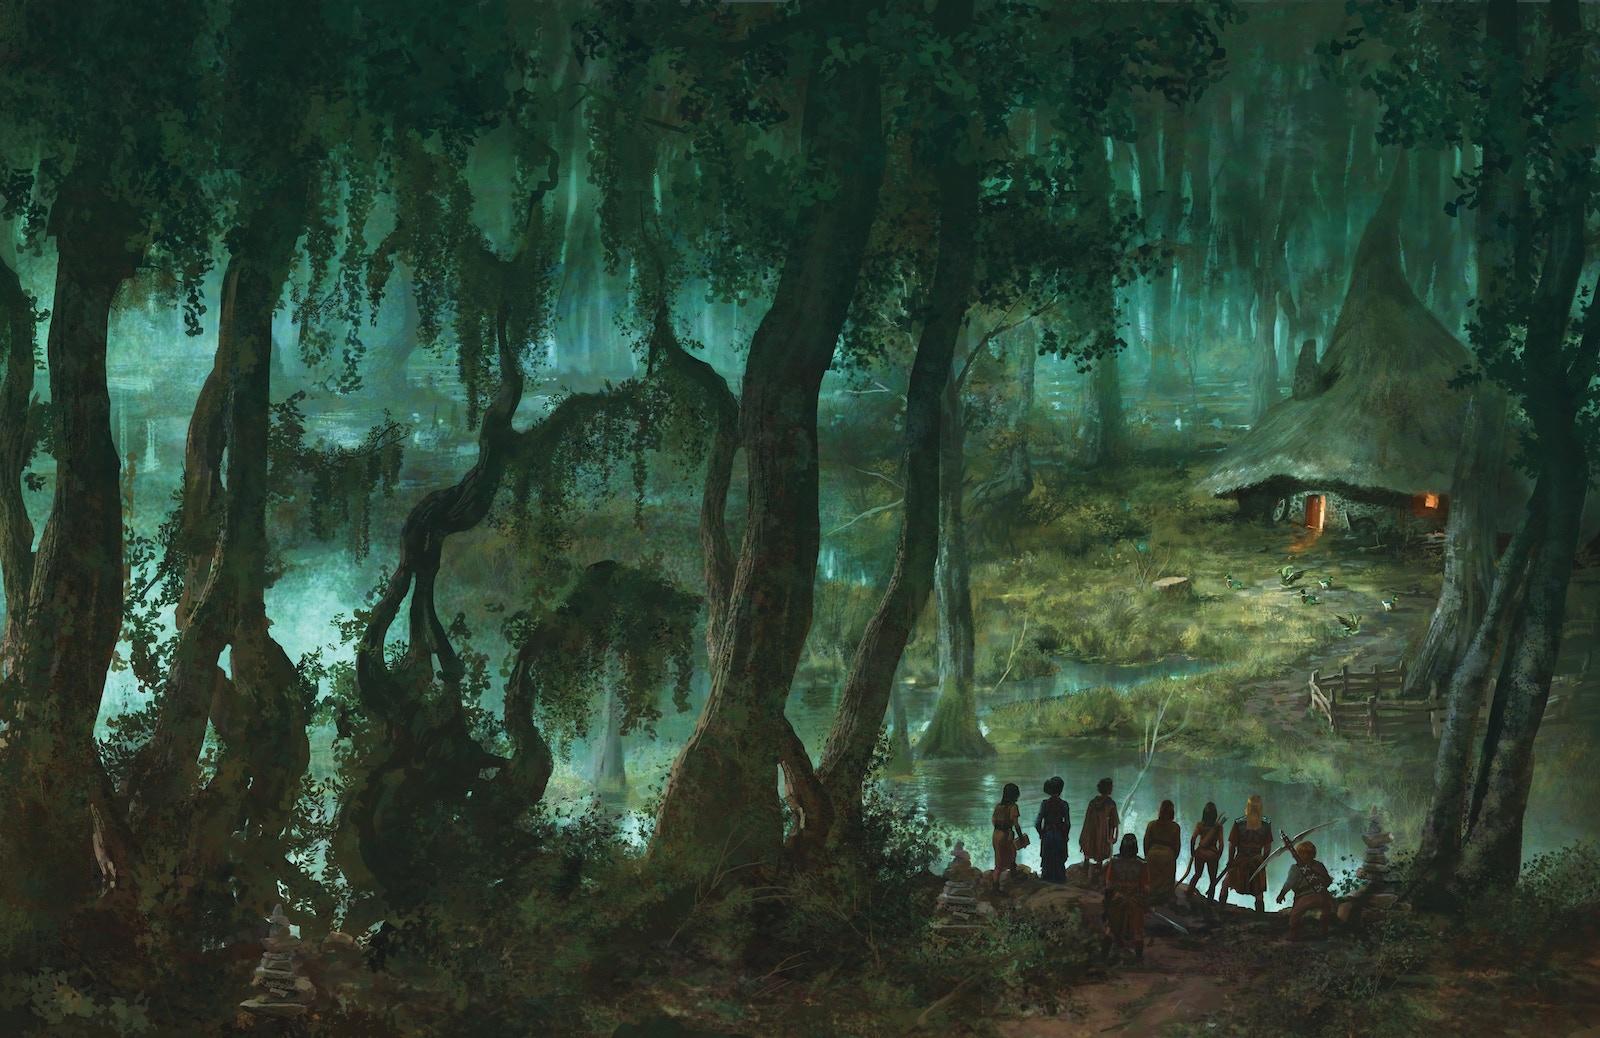 Fantasy Novel: Age of Legend by Michael J. Sullivan